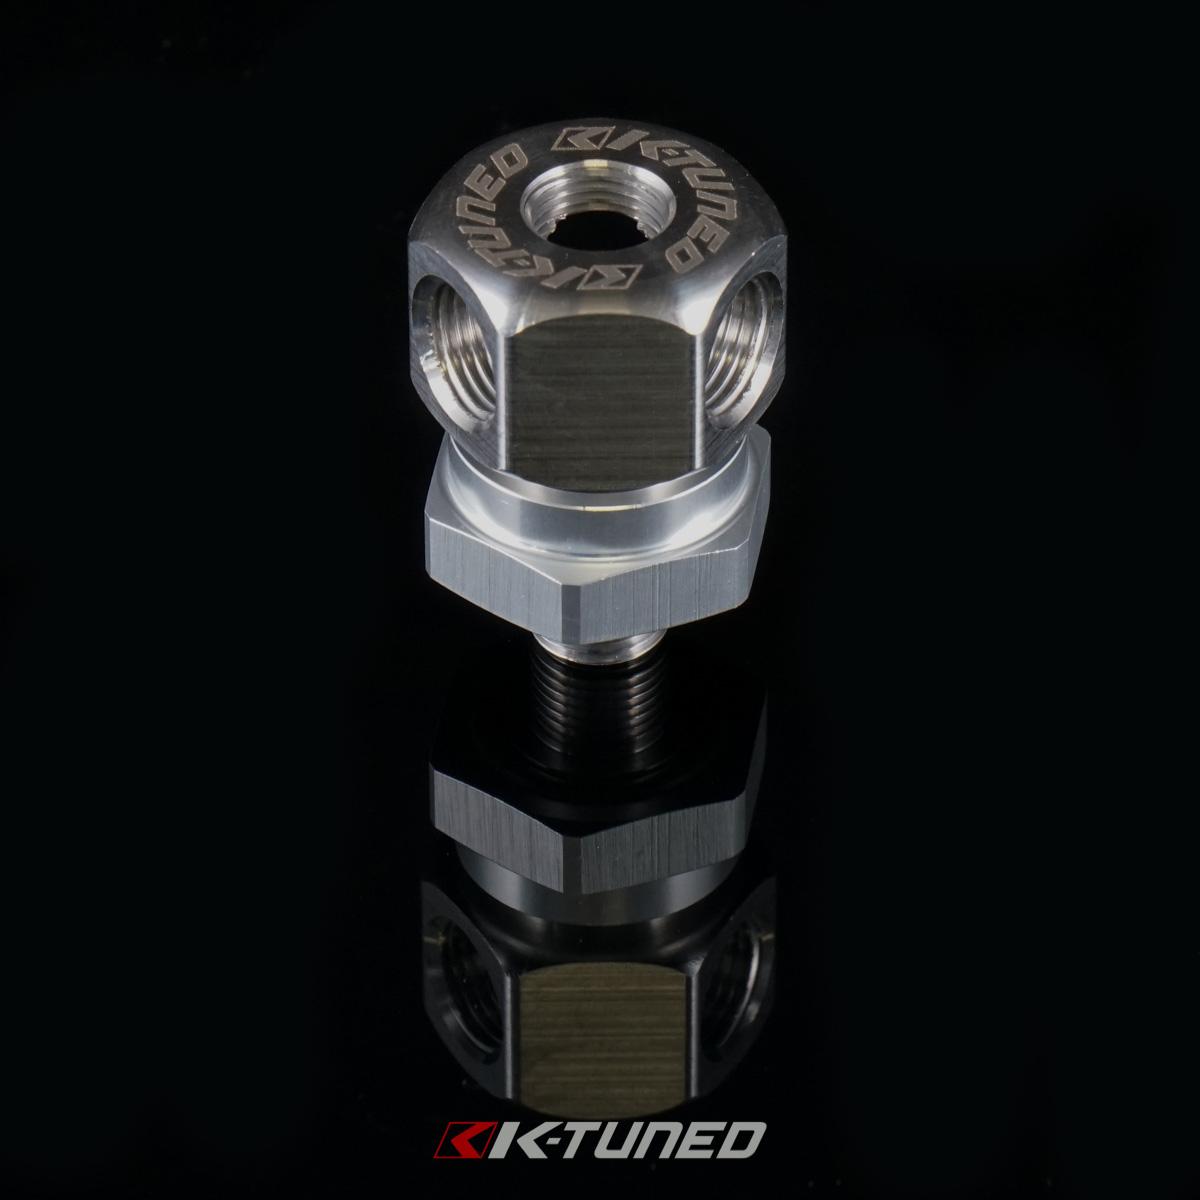 k-tuned.3dcartstores.com